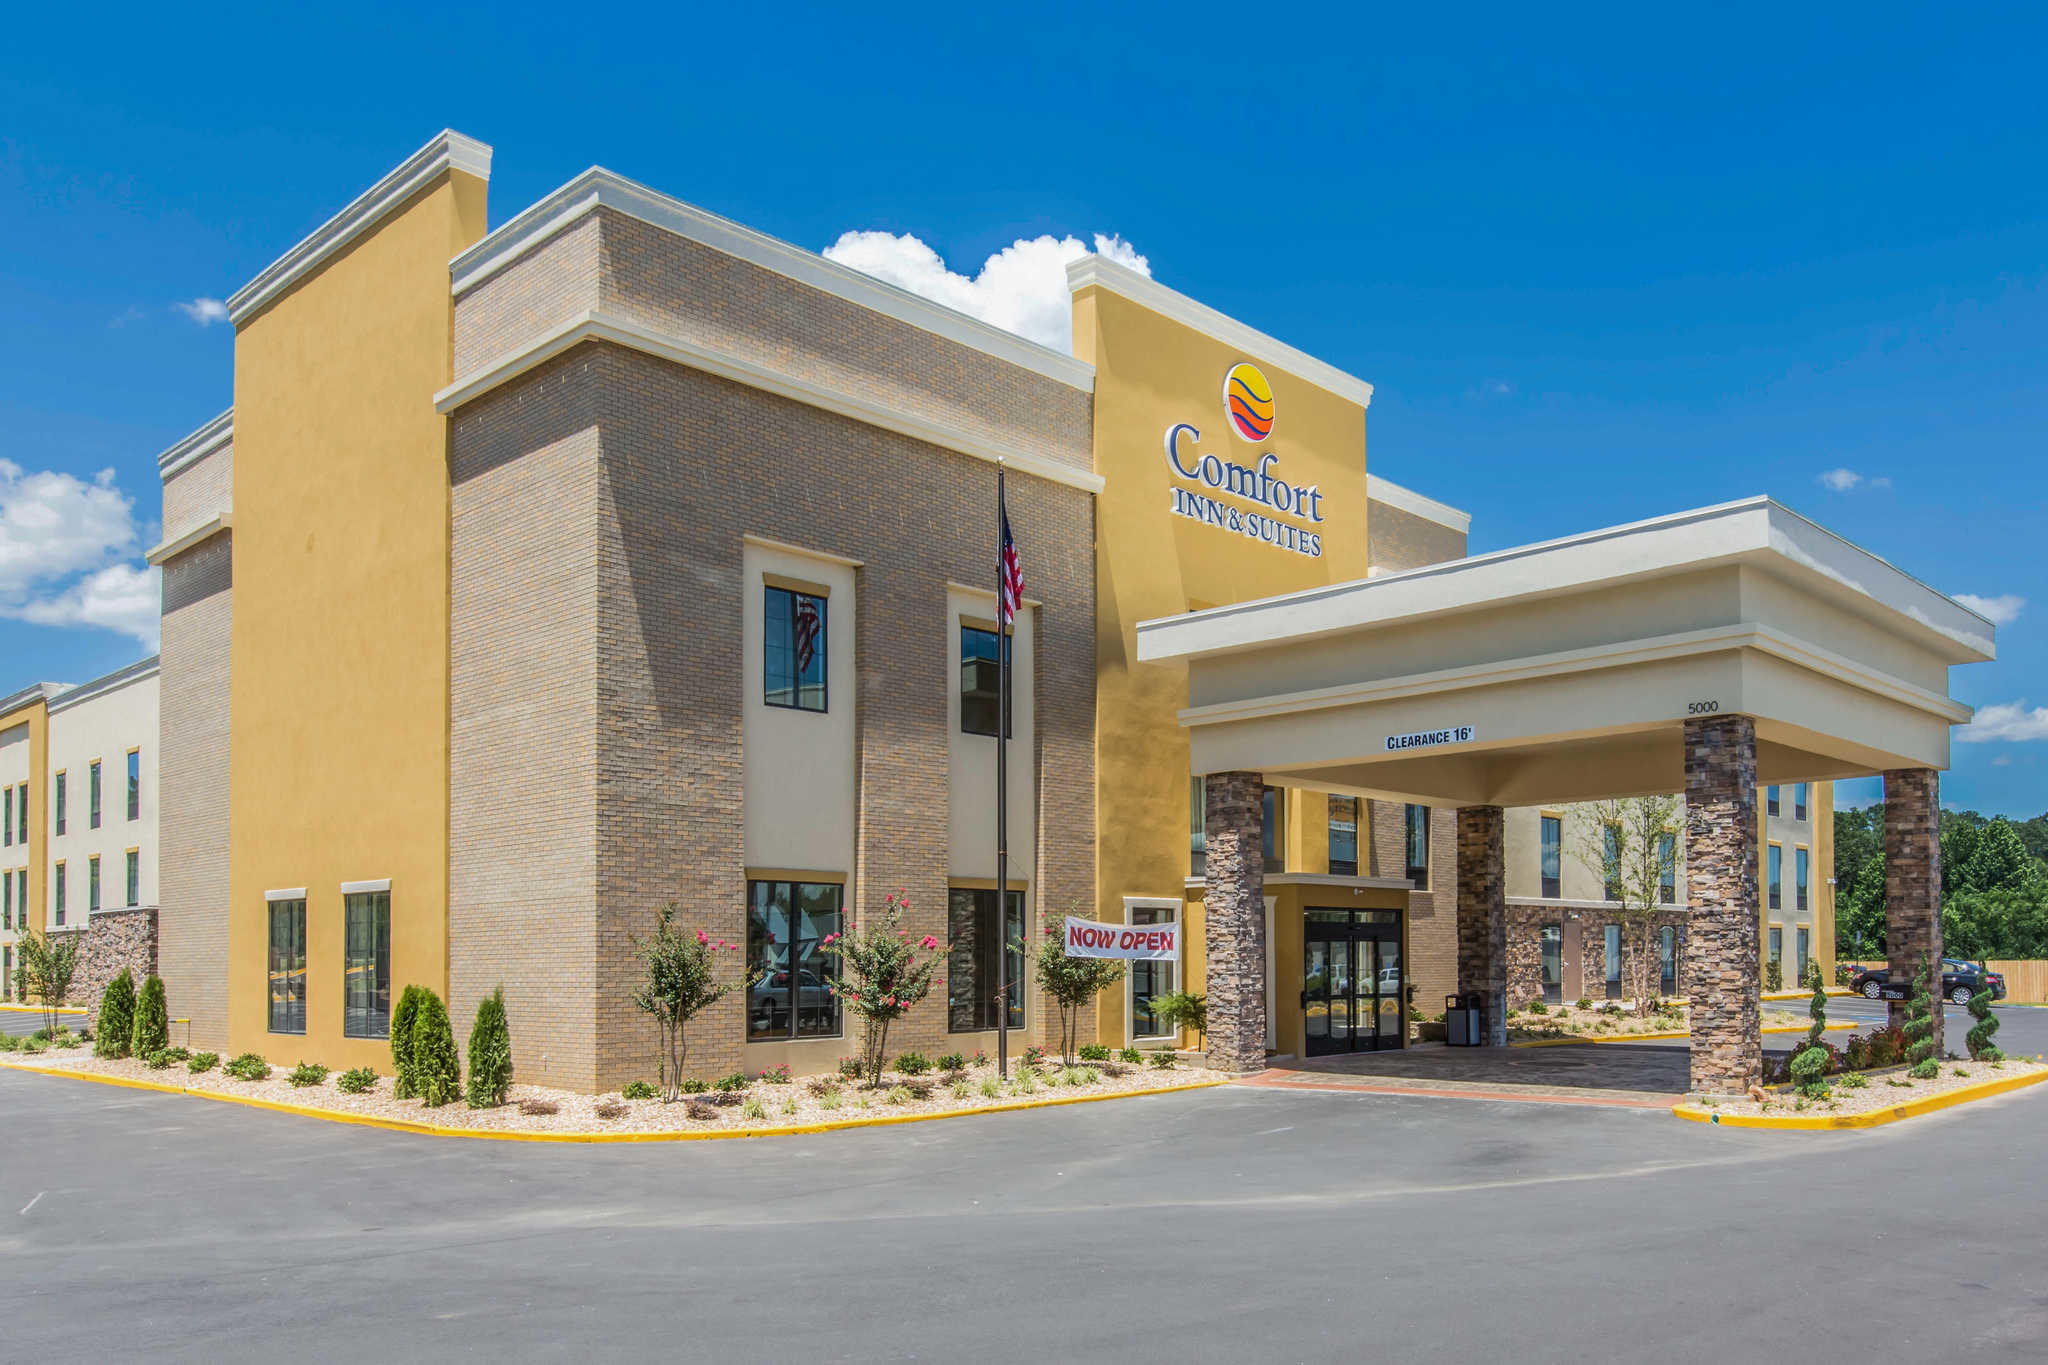 Comfort Inn & Suites West image 0